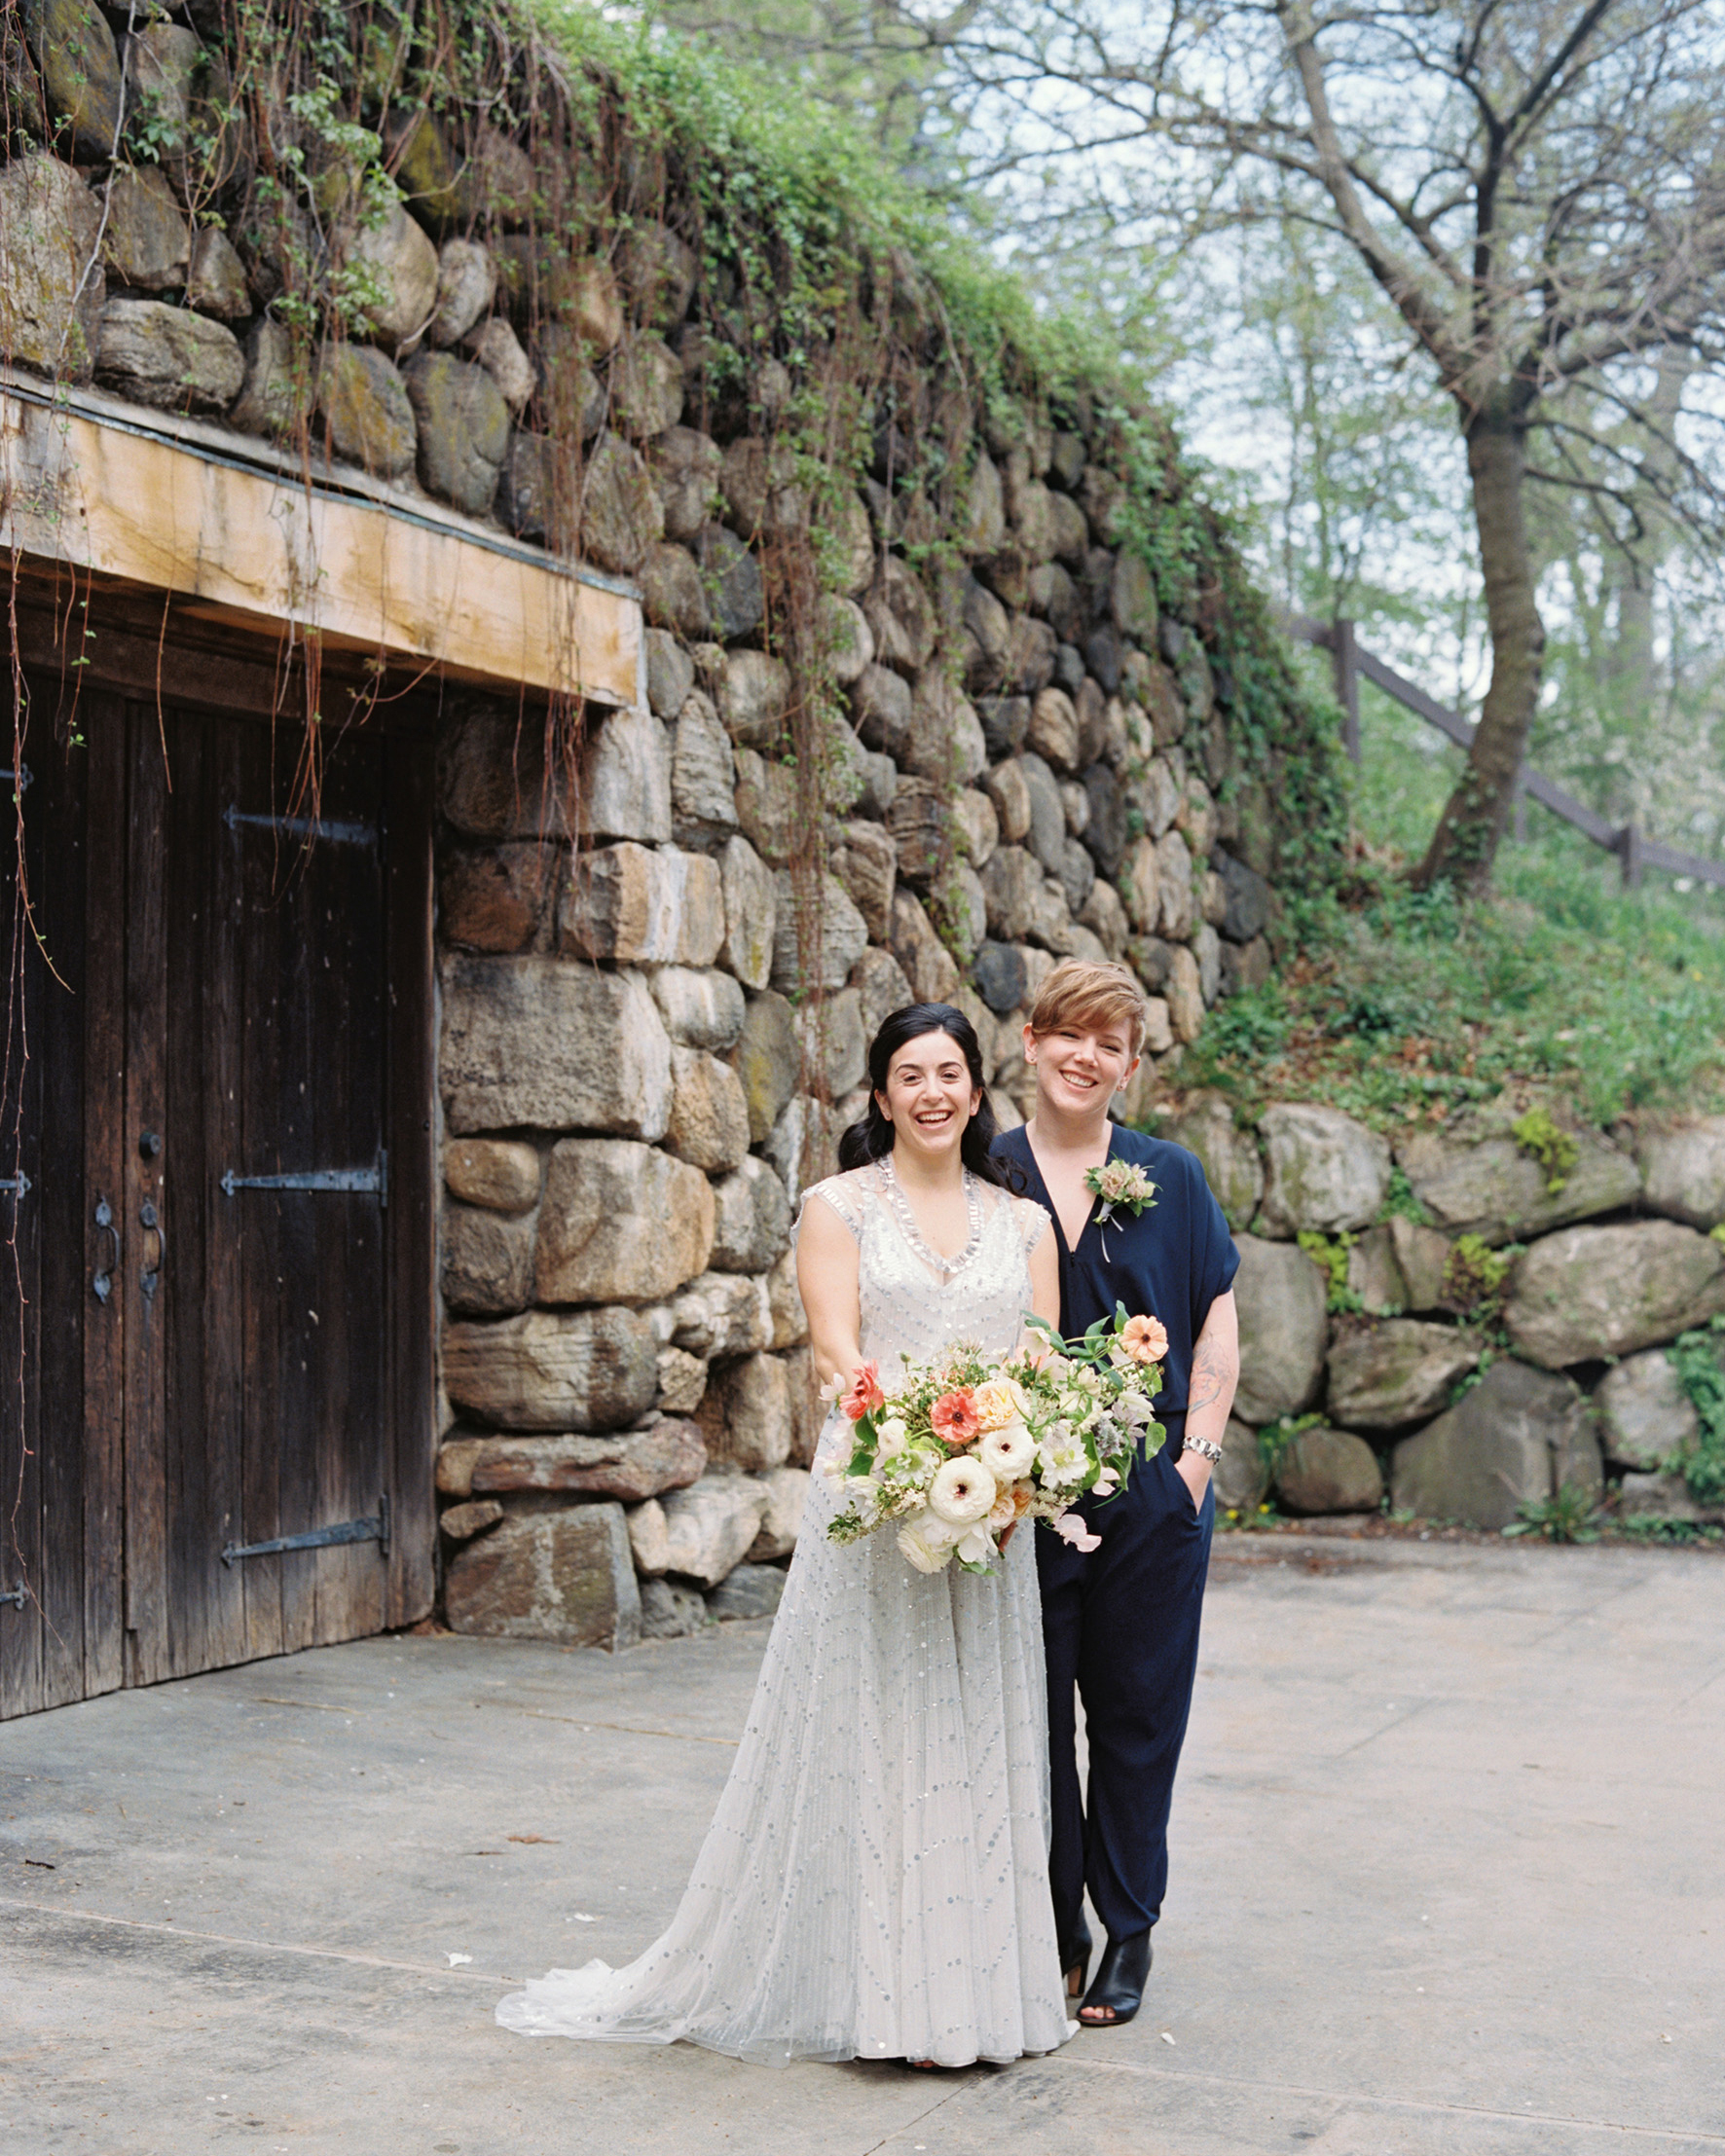 sydney-christina-wedding-couple-023-s111743-0115.jpg